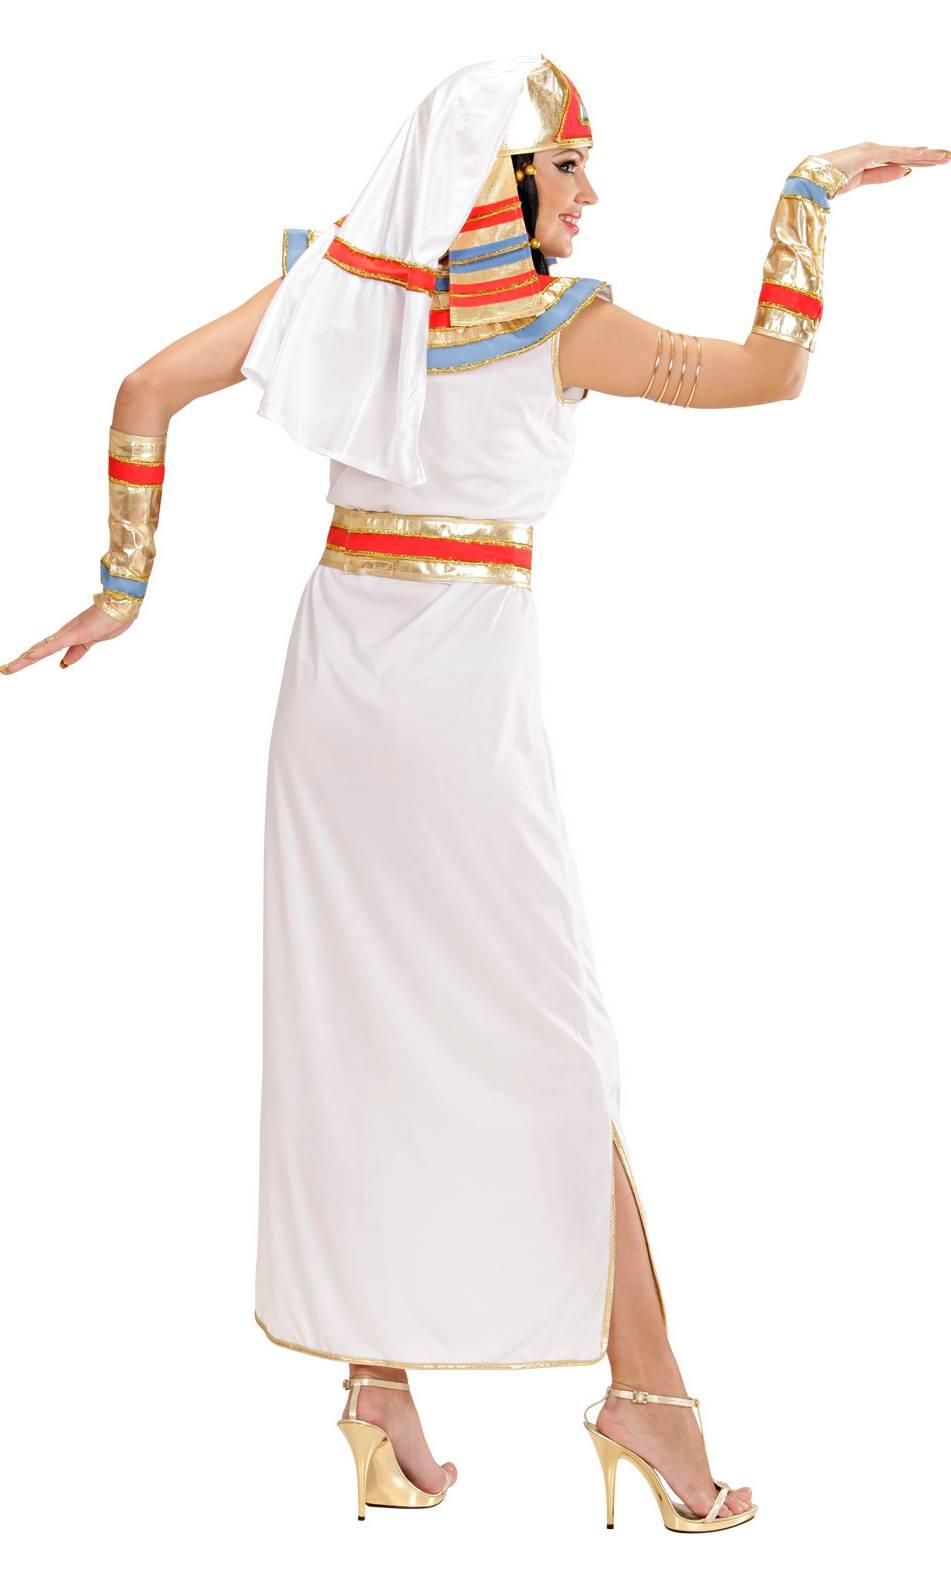 Costume-Egyptienne-Reine-du-Nil-3